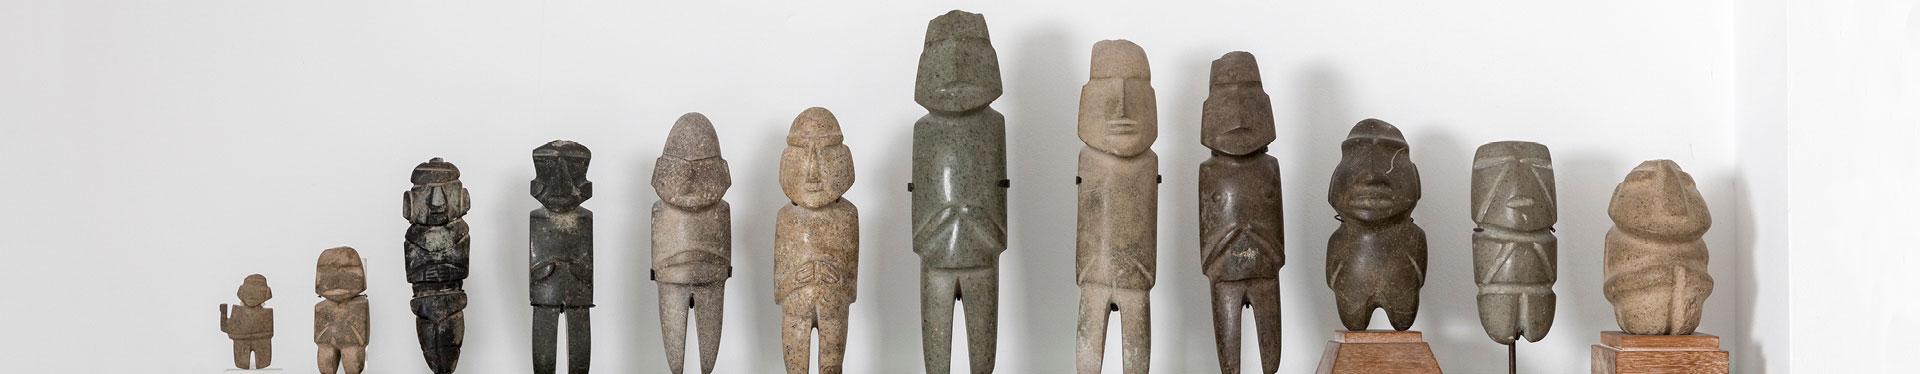 pre-columbian-art-department-christies_91_1_20171213133856.jpg